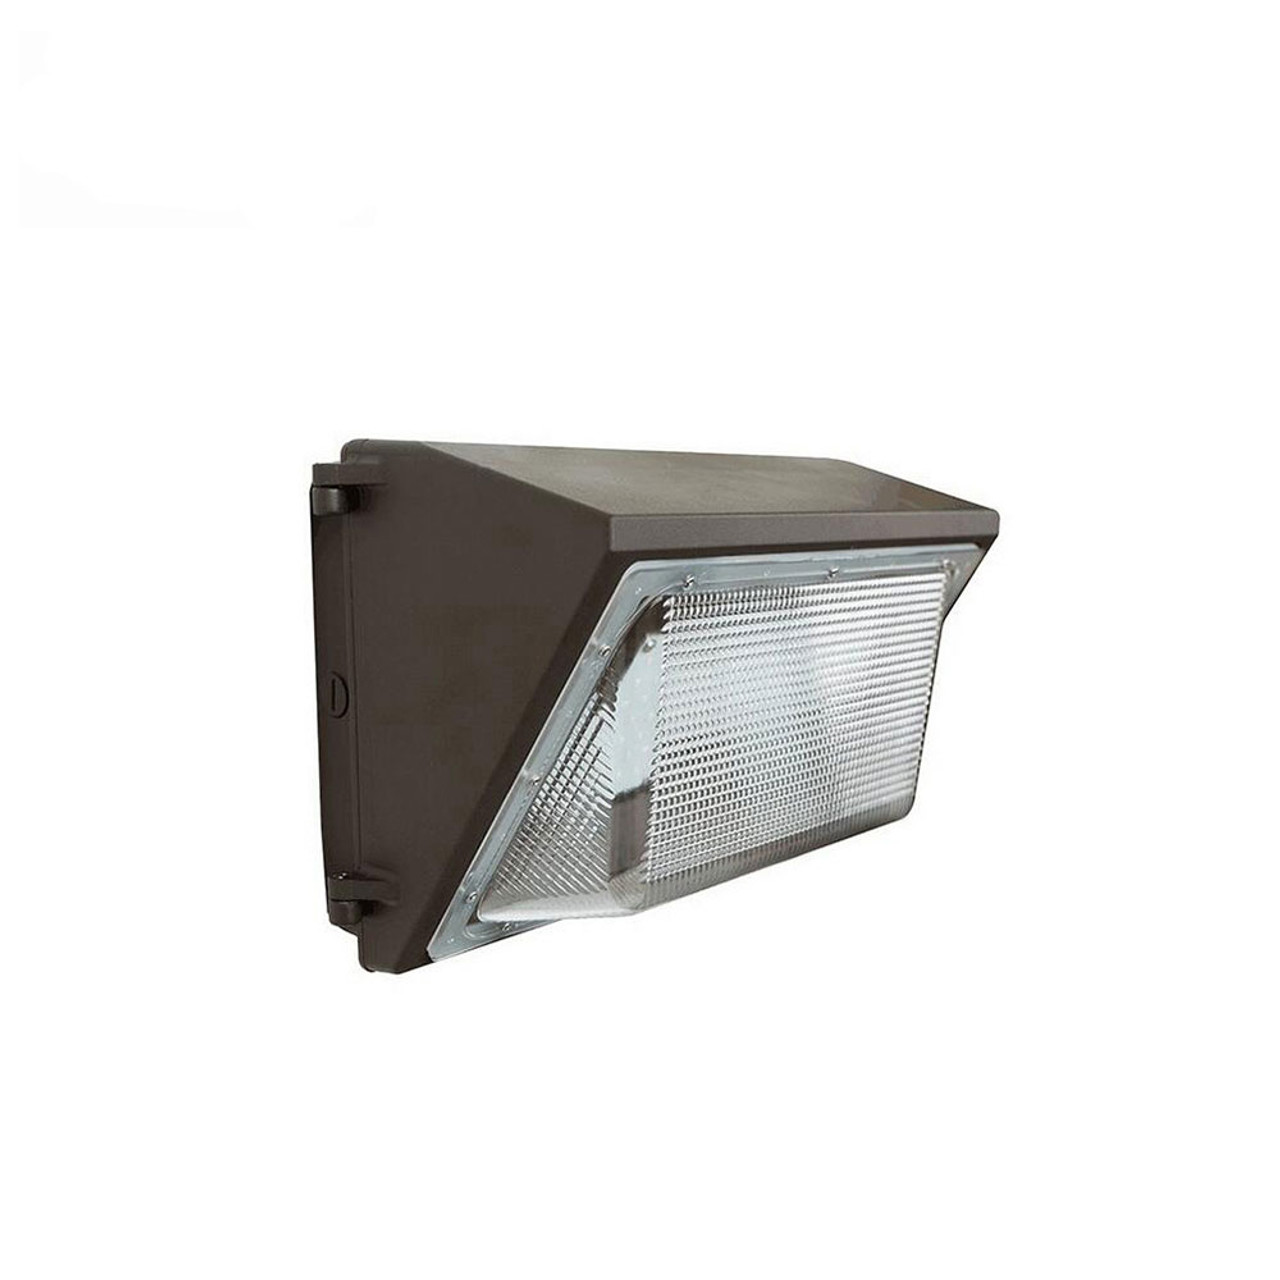 LED Wall Pack, 60 Watt, 7000 lumen, 5000 Kelvin, 480 volt, UL and DLC Listed